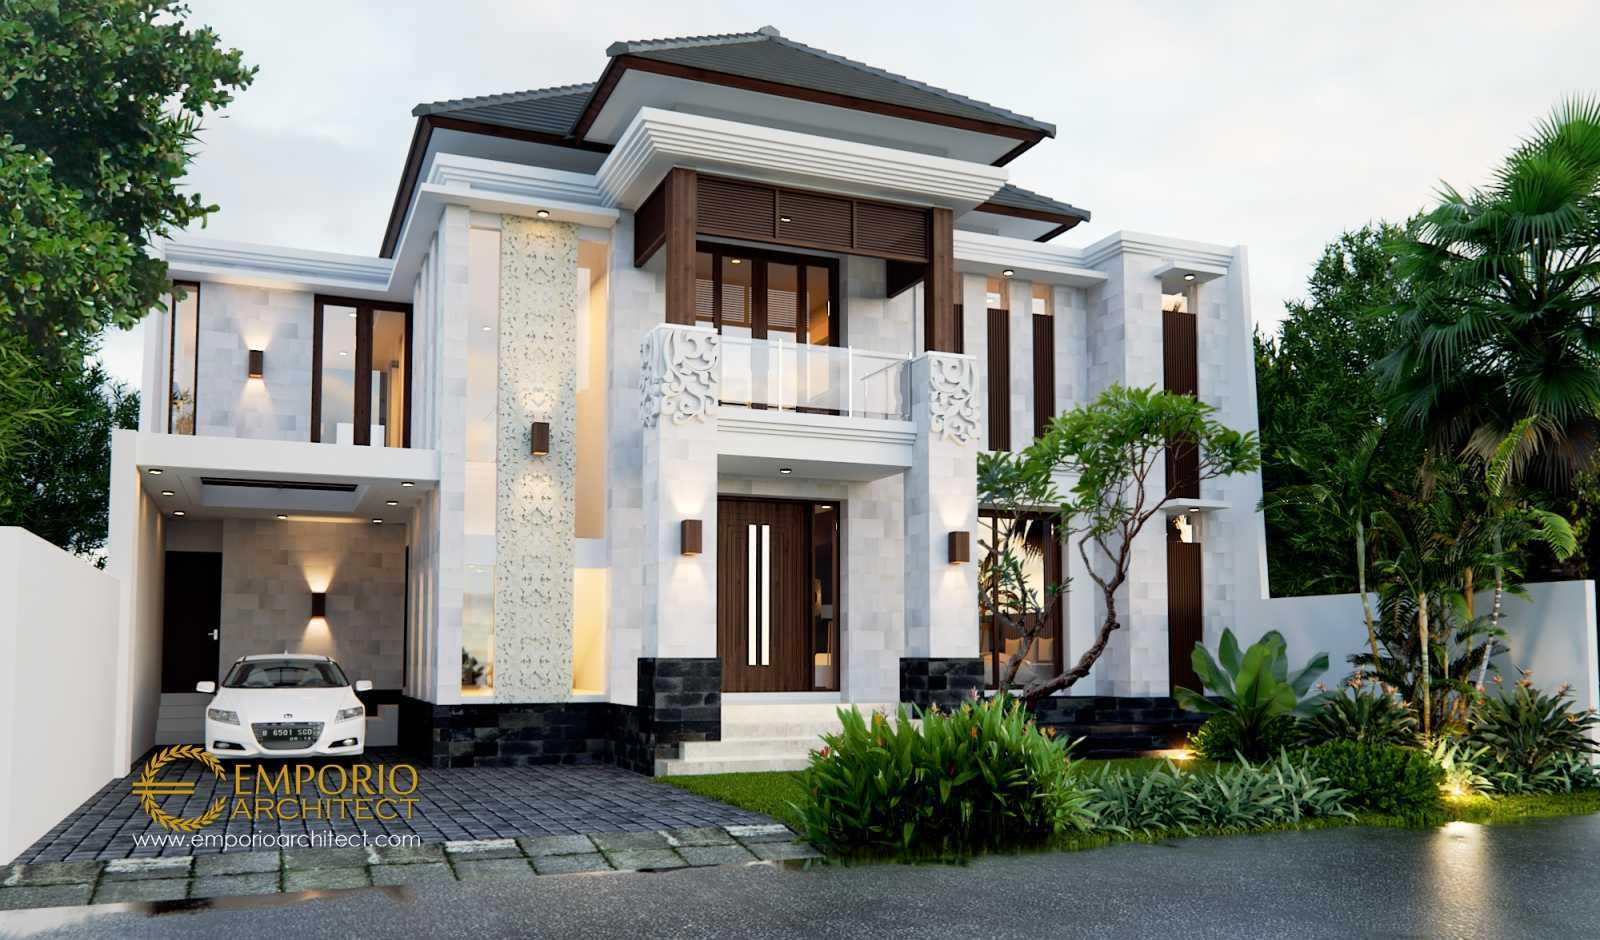 Emporio Architect Desain Rumah Villa Bali Tropis 495 @ Cikarang, Bekasi Cikarang, Bekasi, Jawa Barat, Indonesia Cikarang, Bekasi, Jawa Barat, Indonesia Emporio-Architect-Desain-Rumah-Villa-Bali-Tropis-495-Cikarang-Bekasi Tropical 78305